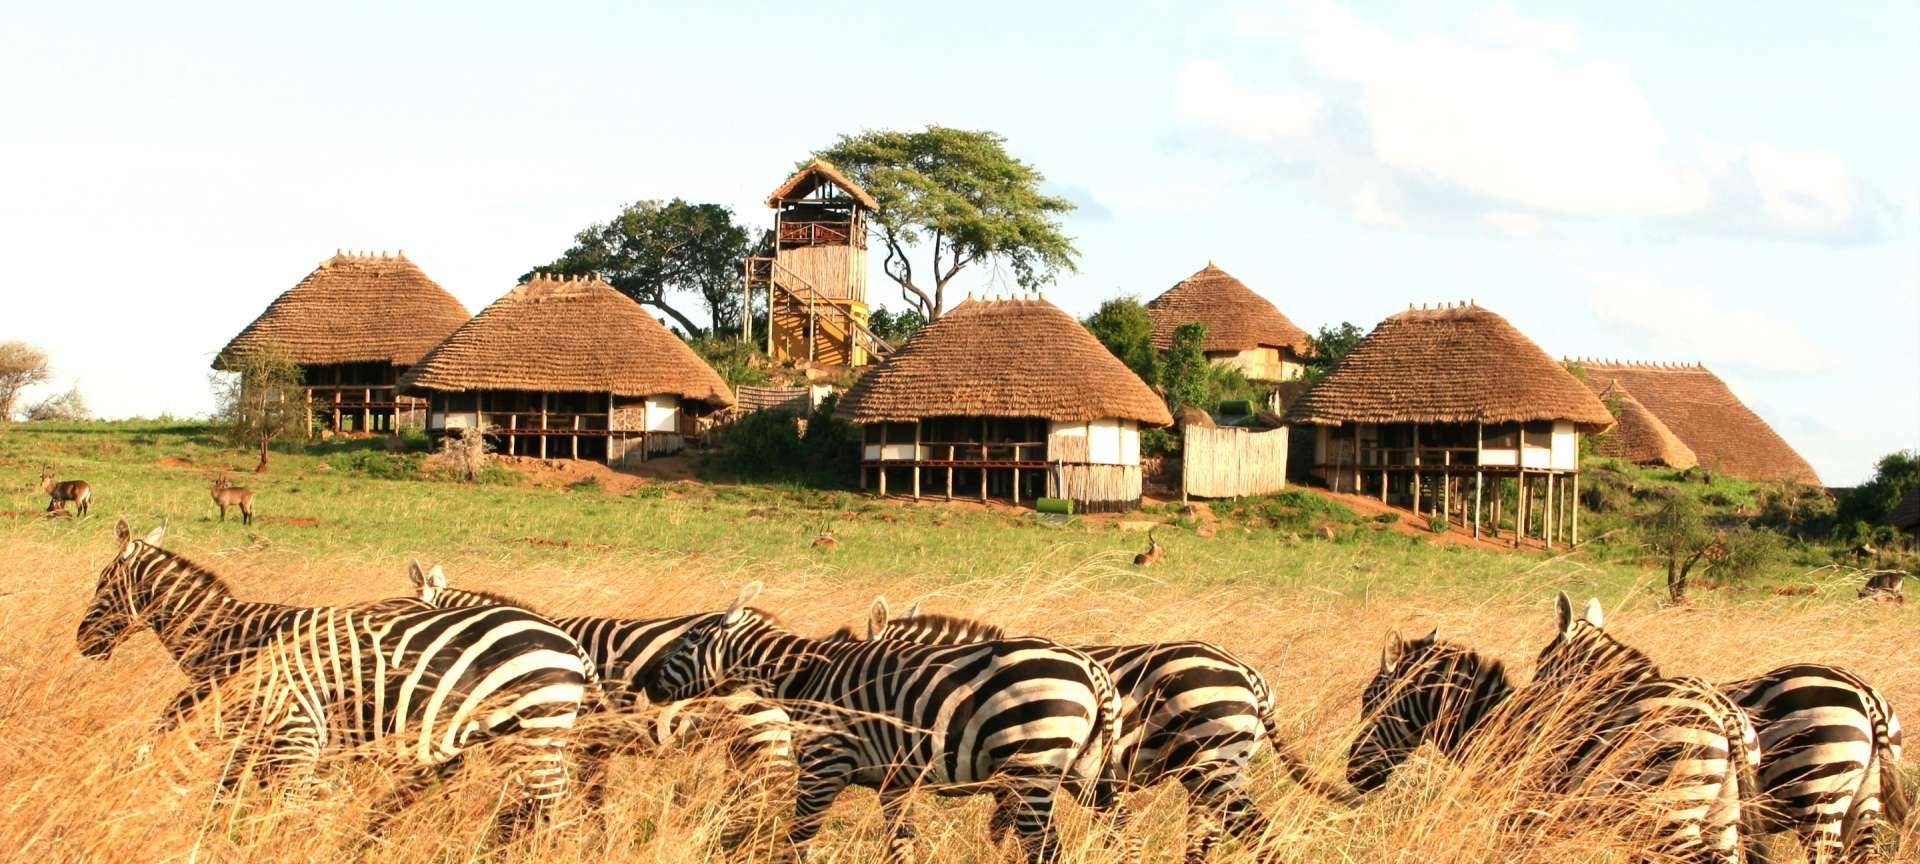 Kidepo Valley National Park - Africa Wildlife Safaris